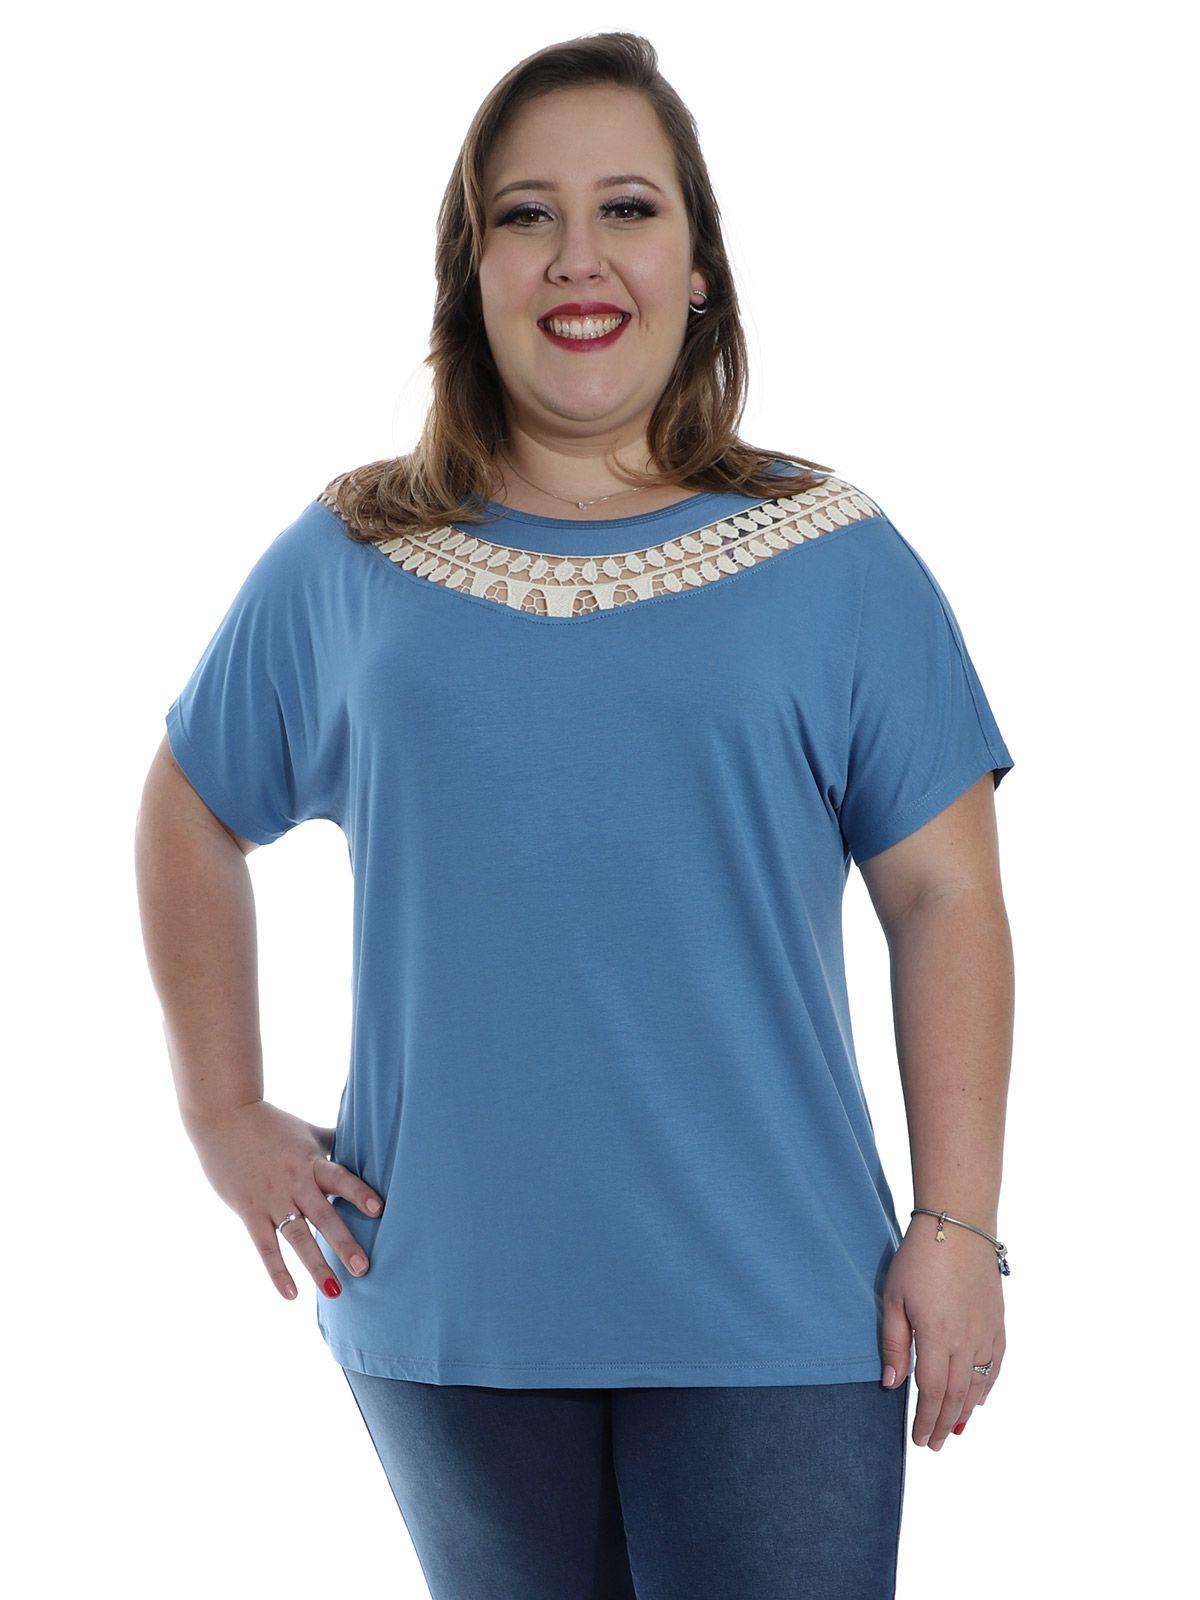 Blusa Plus Size Decote com Renda de Guipir KTS Azul